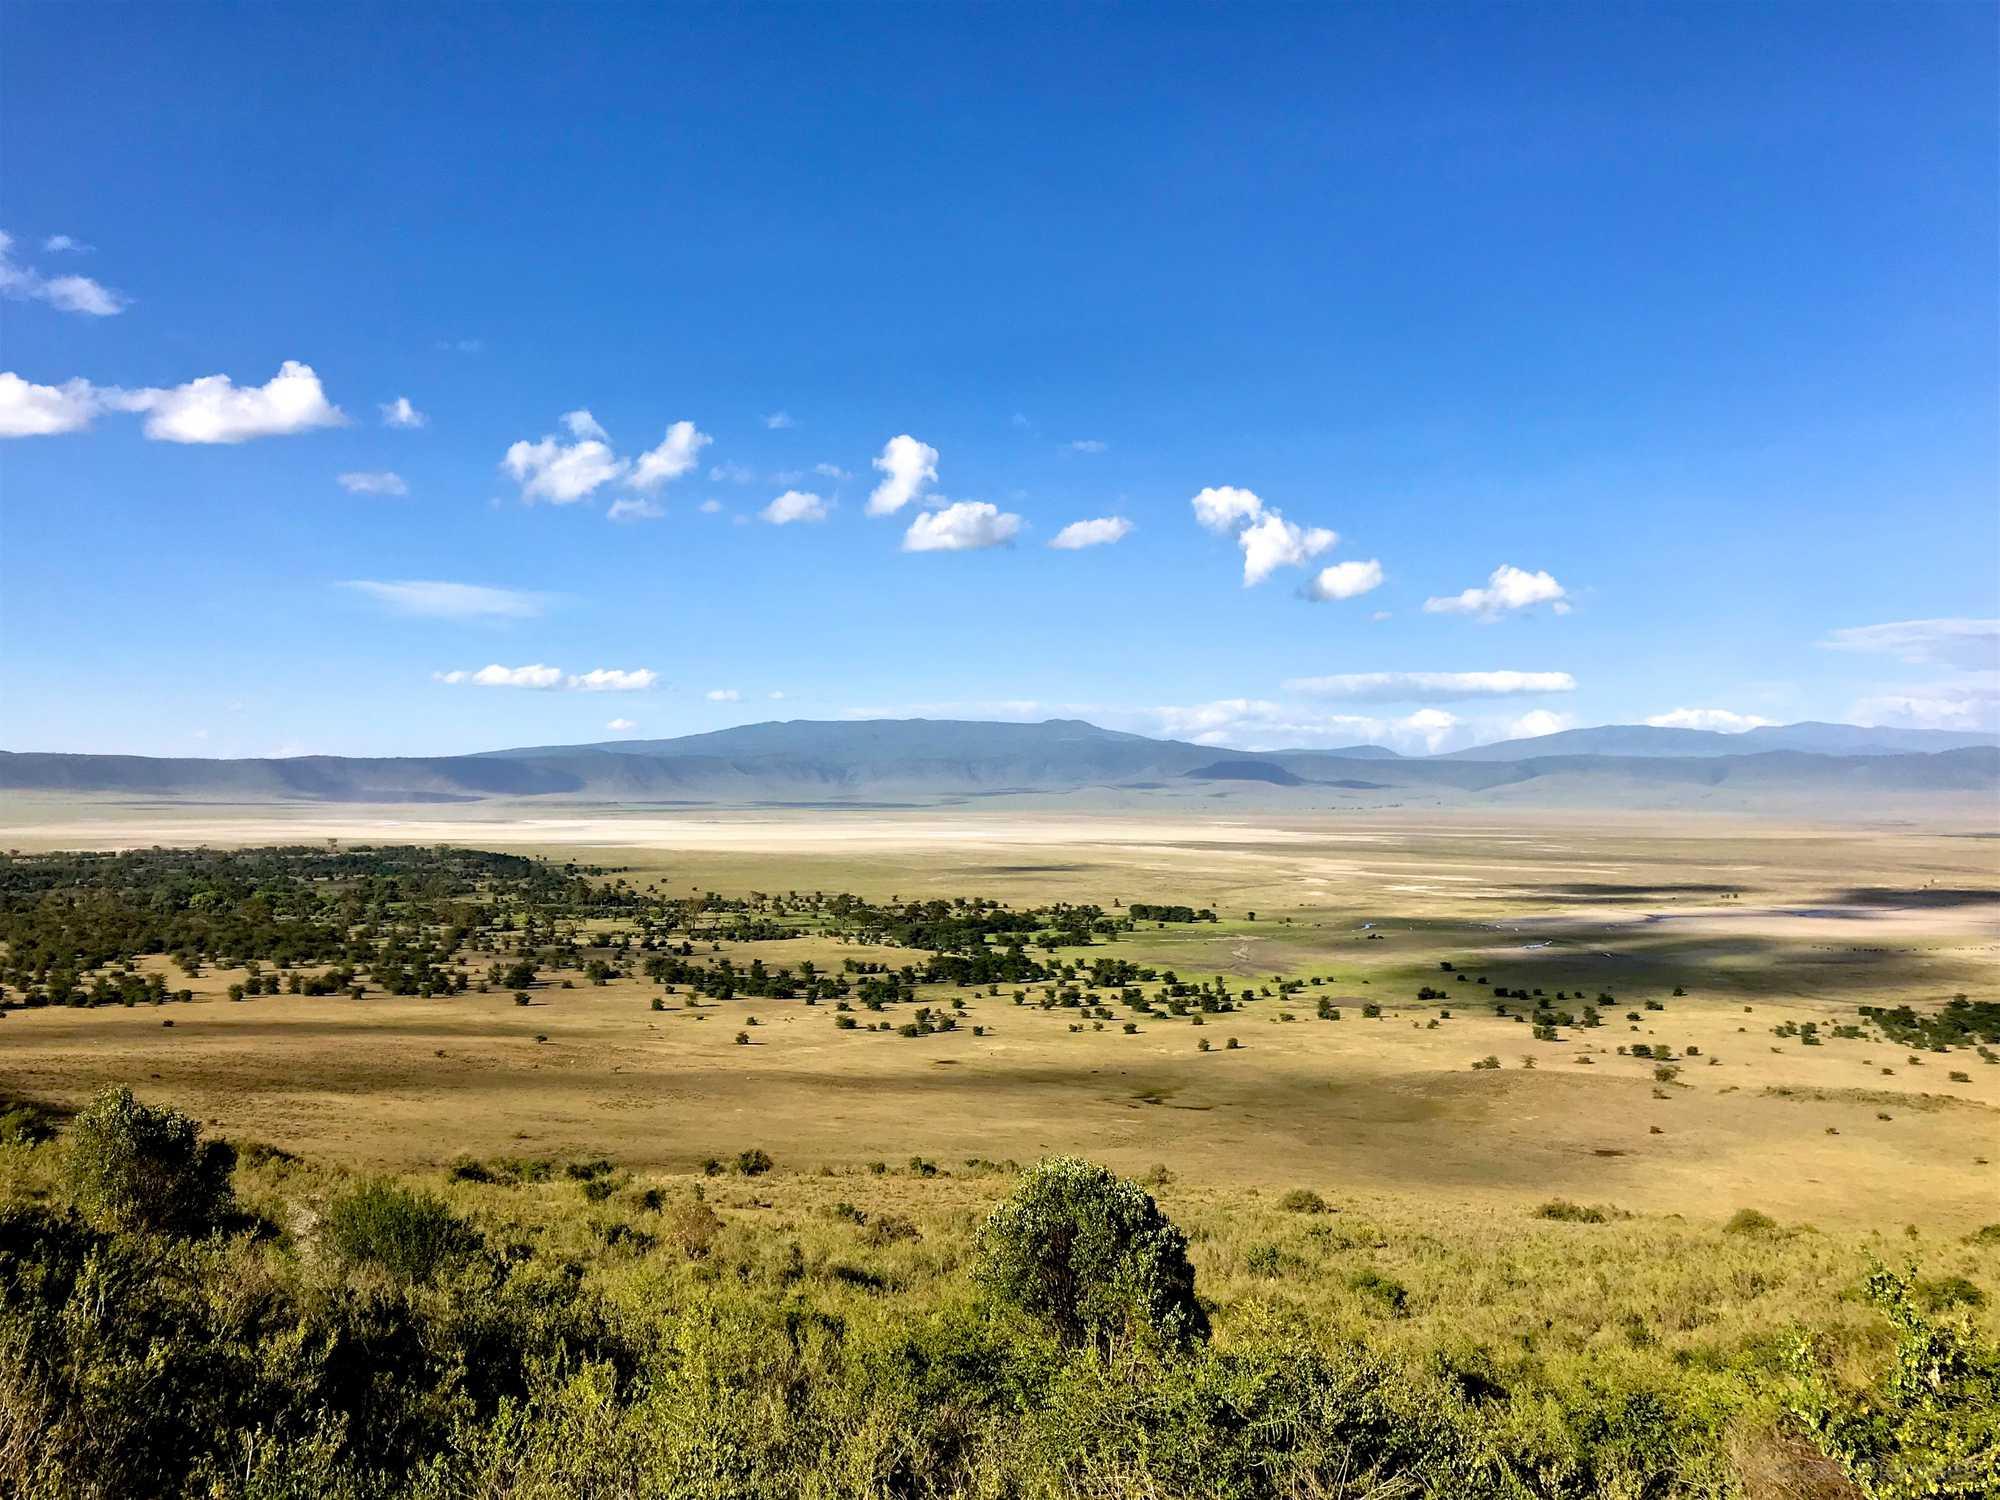 Tanzania Ngorongoro Crater Plane